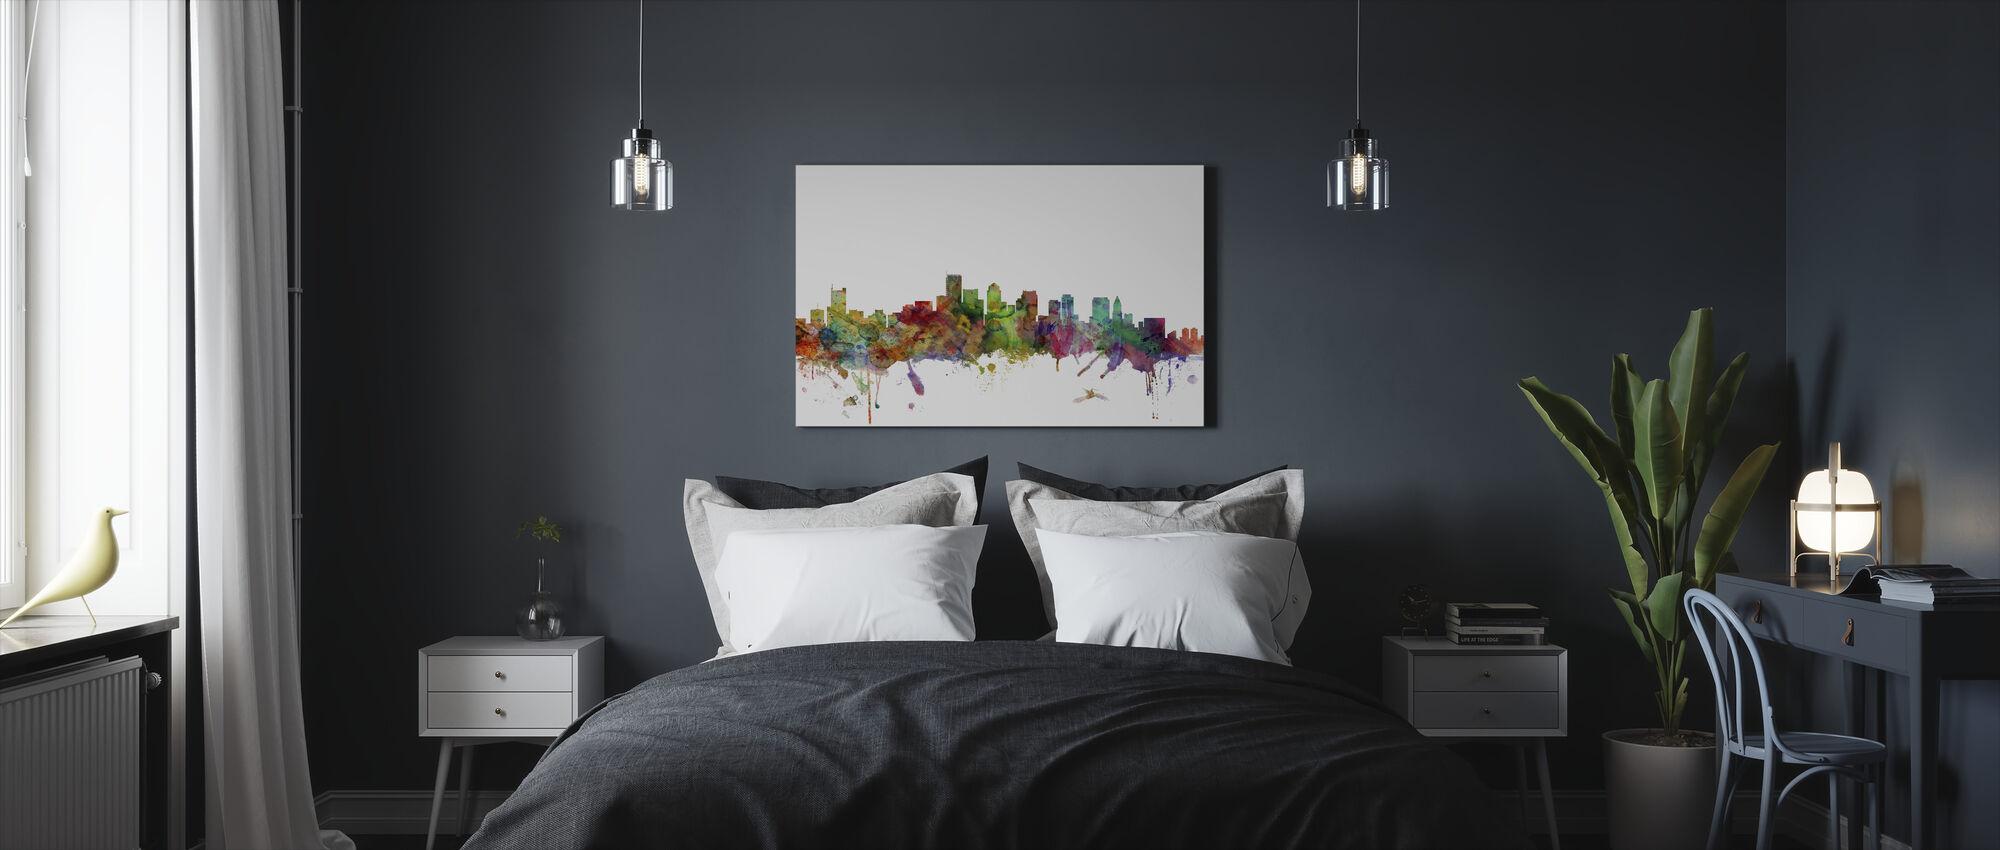 Boston Massachusetts Skyline - Canvas print - Bedroom